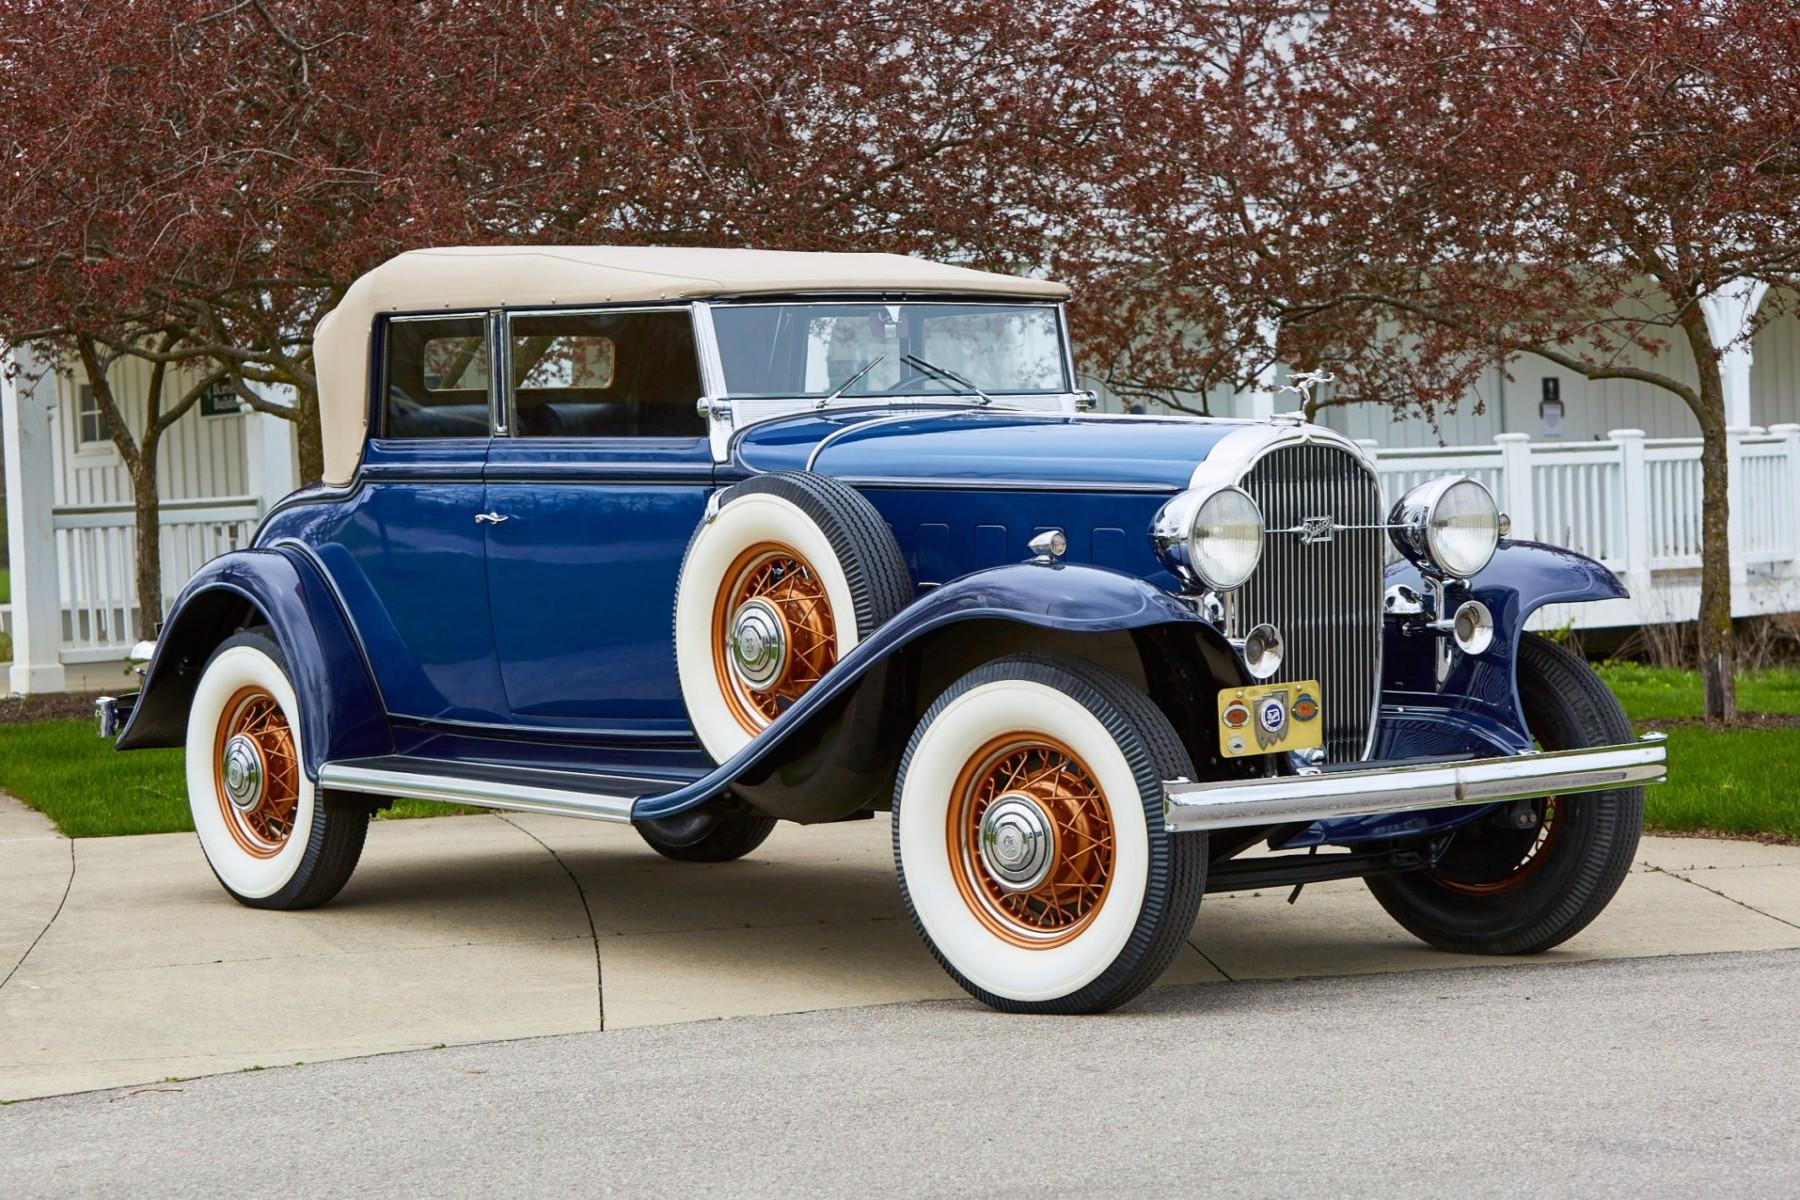 1932 Buick Model 98 Convertible Phaeton 2